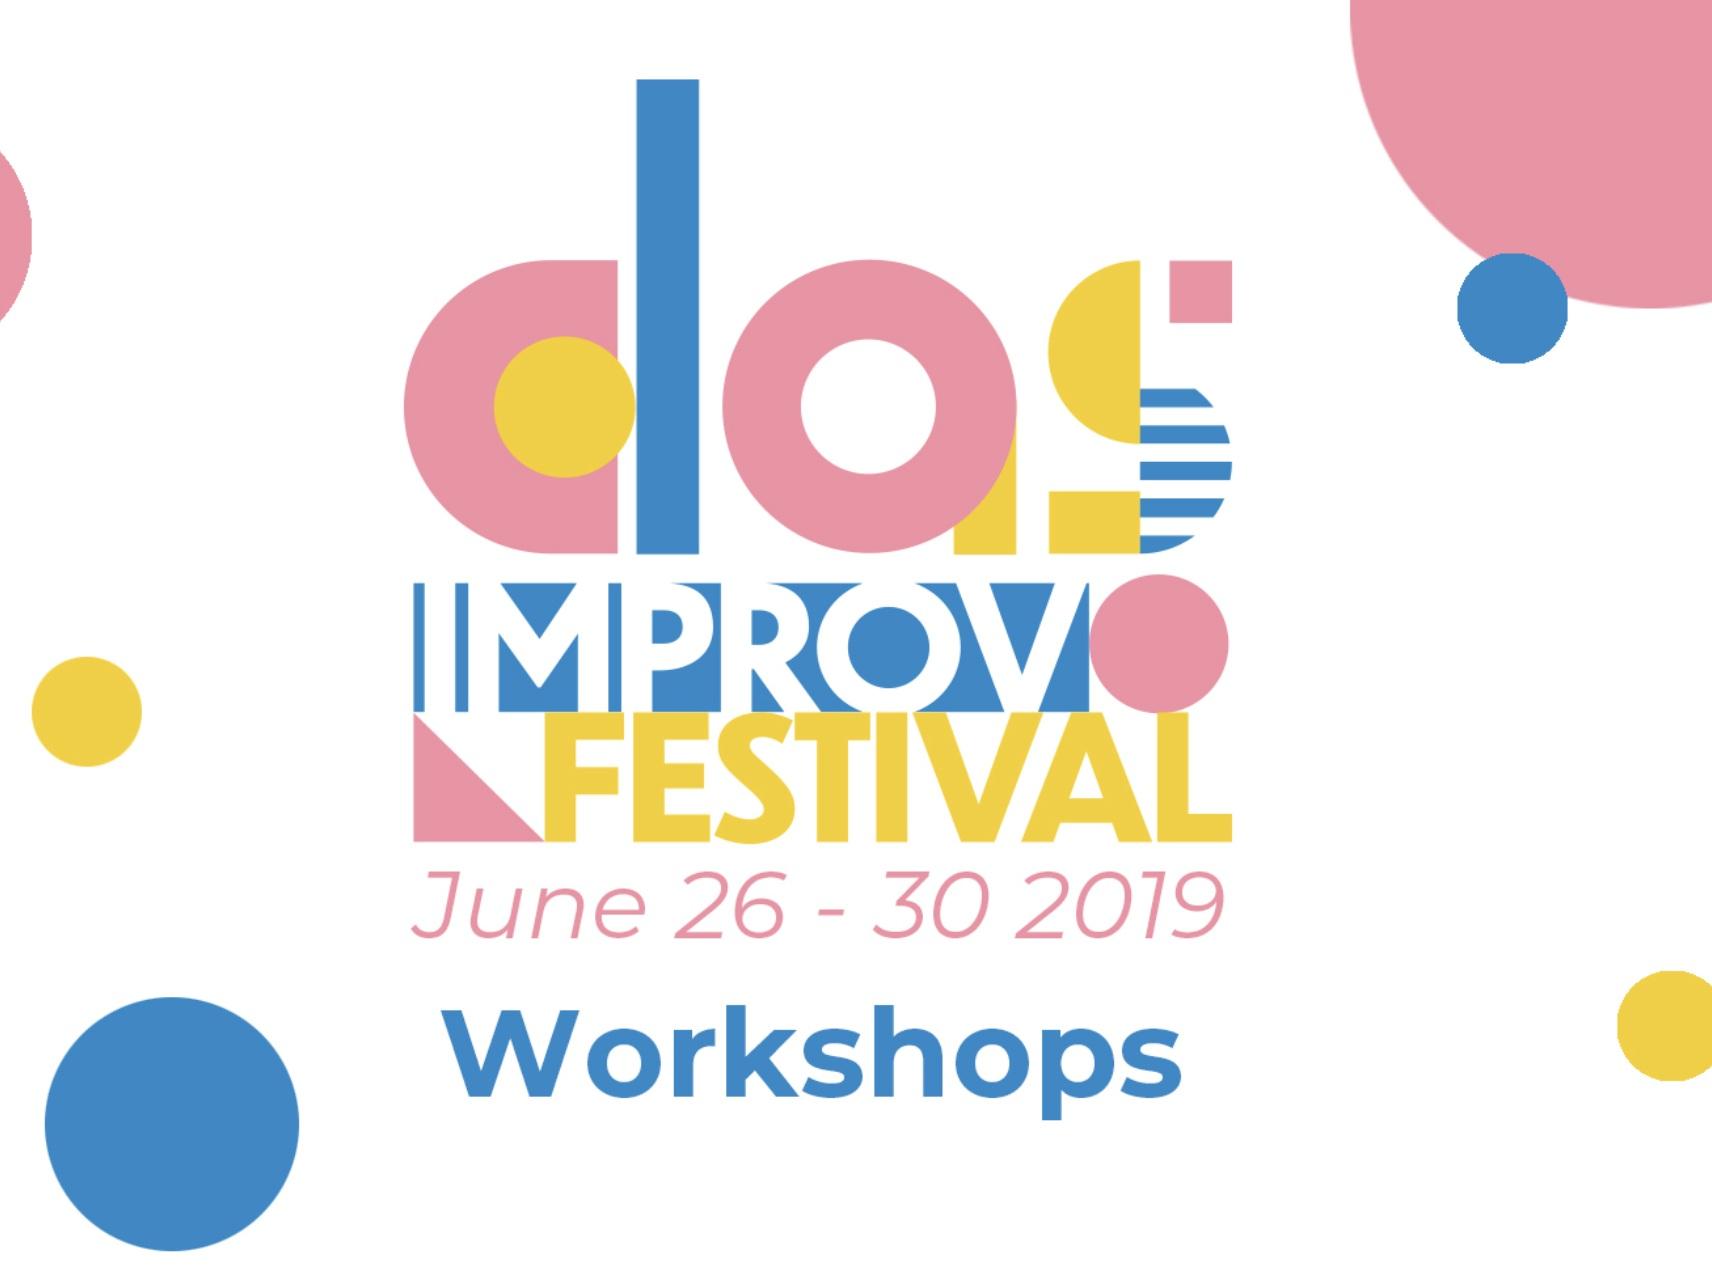 "Berlin - Das Improv Festival""On Camera Auditioning ""Thursday, 27th June1:15pm - 4:15pm REGISTER HEREDas Improv Festival Group Ownership Friday 28th June2:15pm - 5:15pm REGISTER HERE"